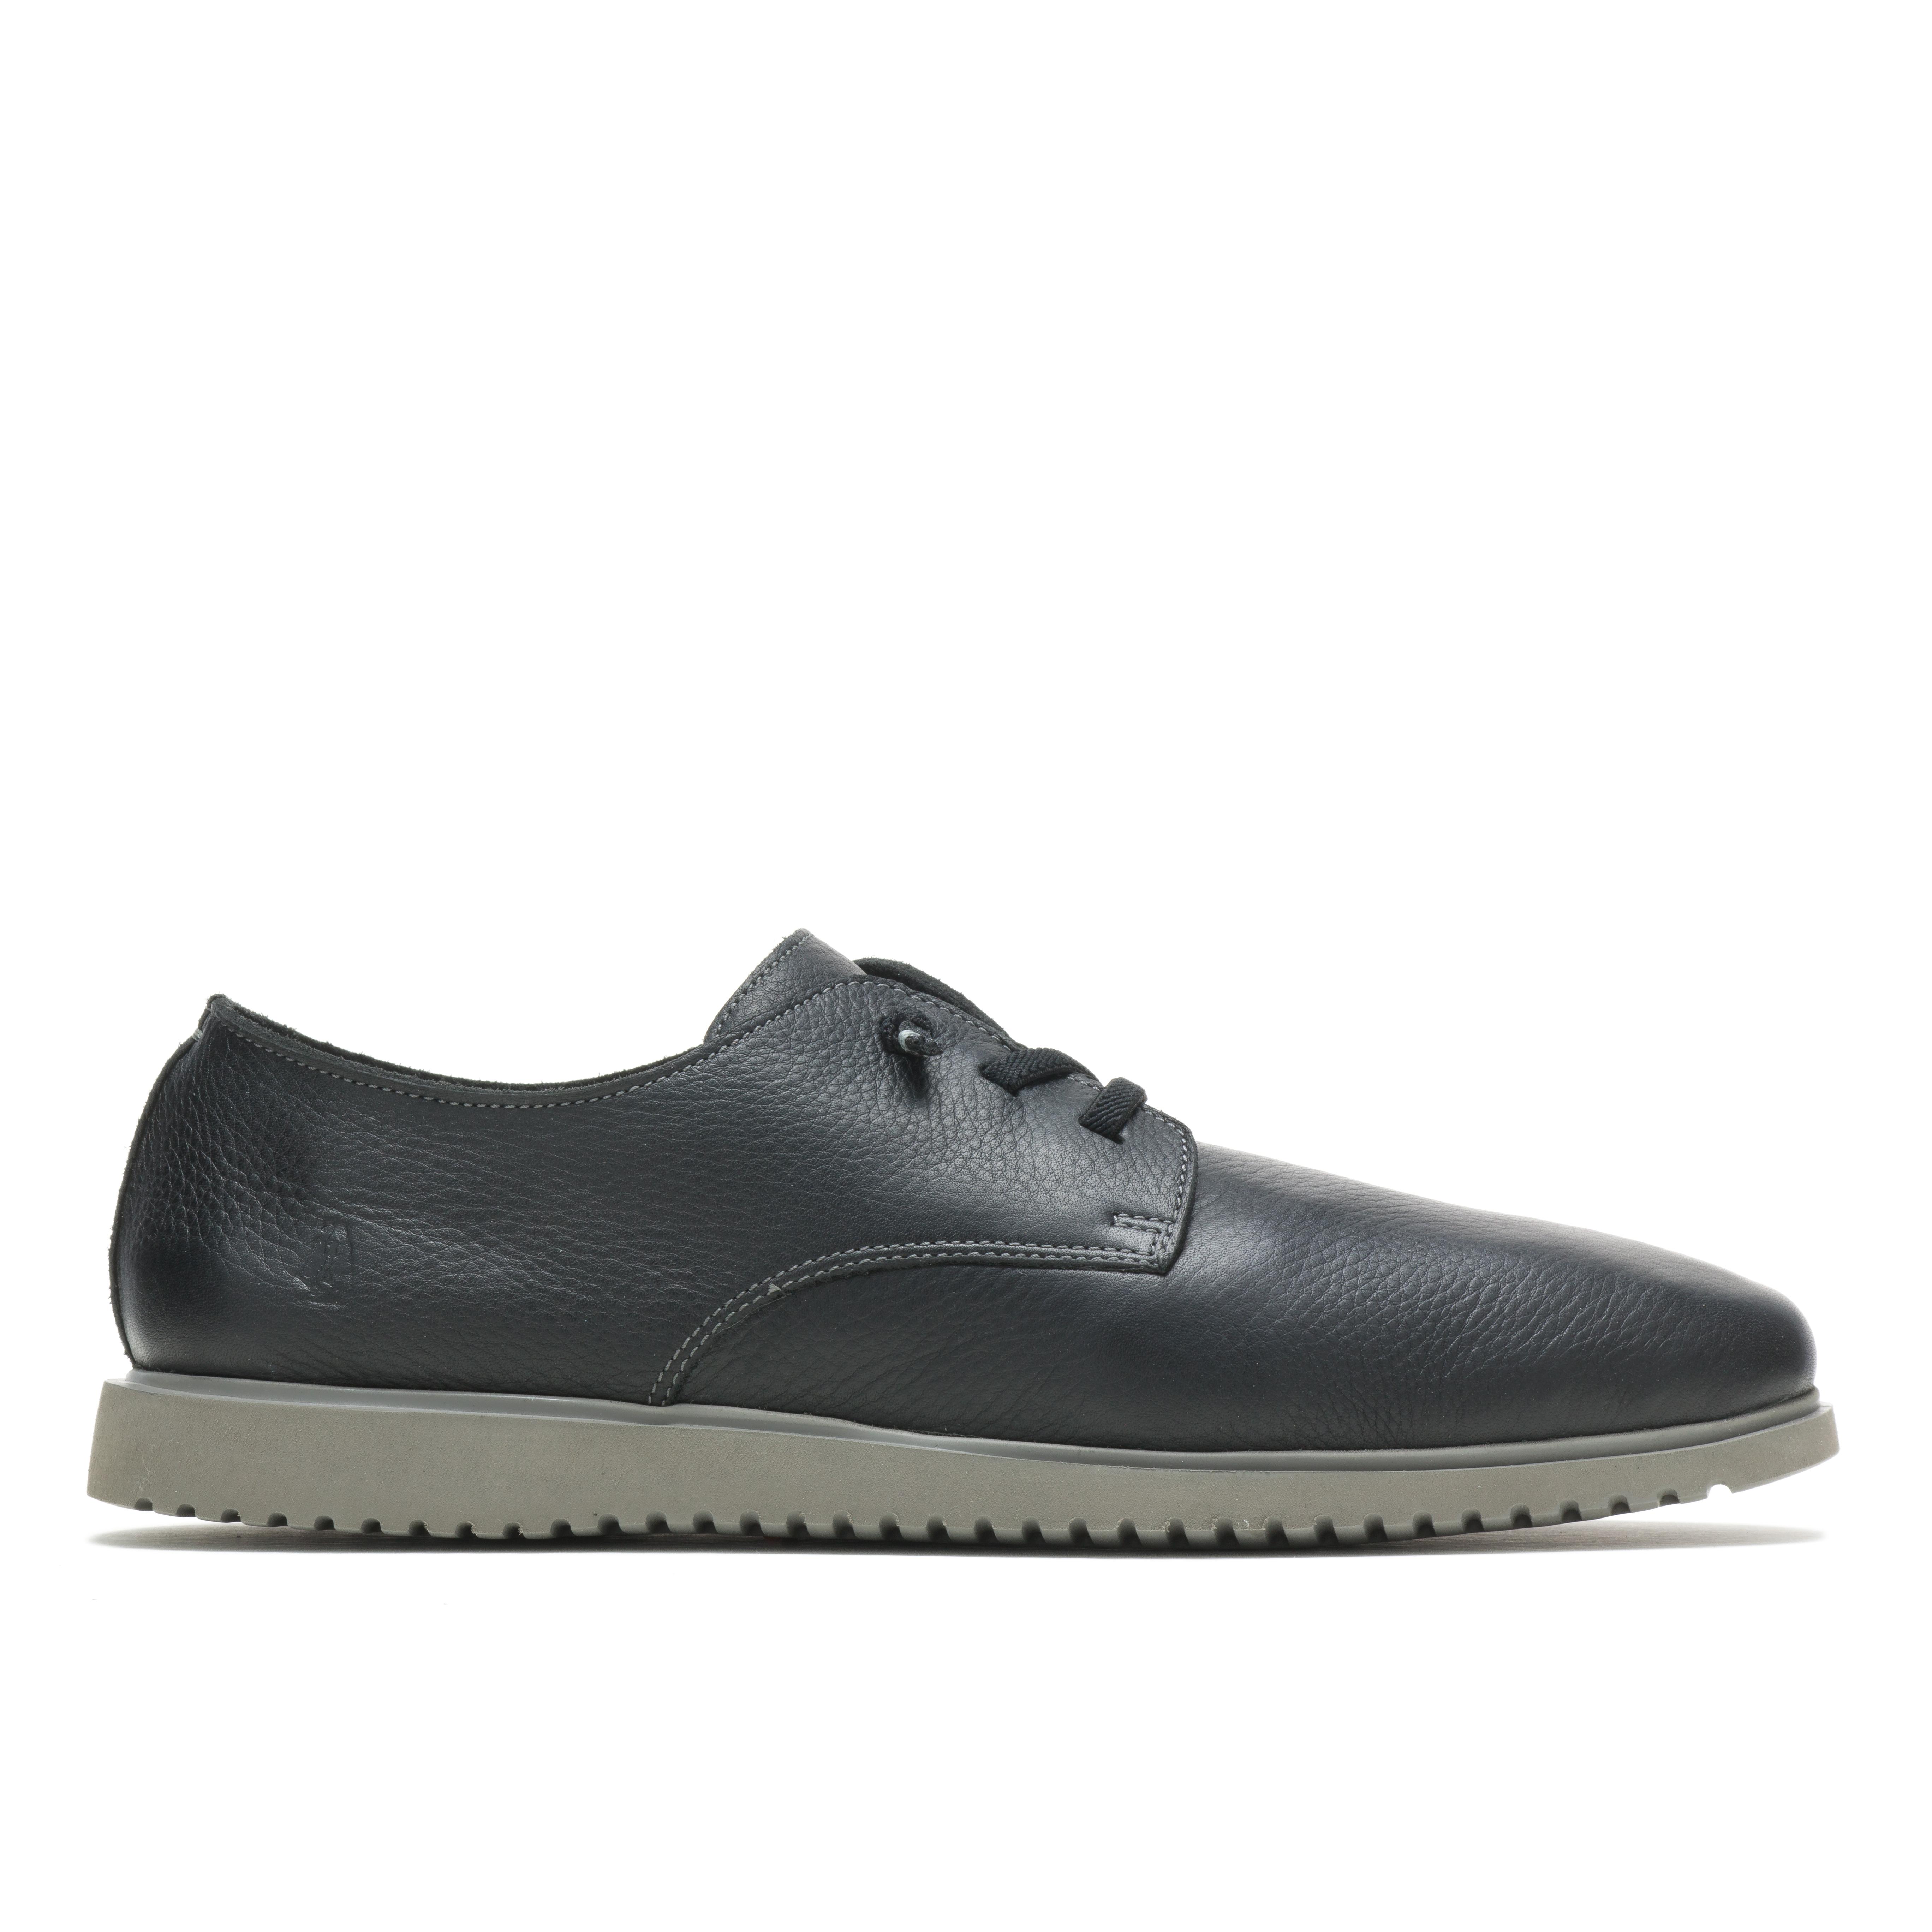 Hush everyday lace up sko, black leather, 43